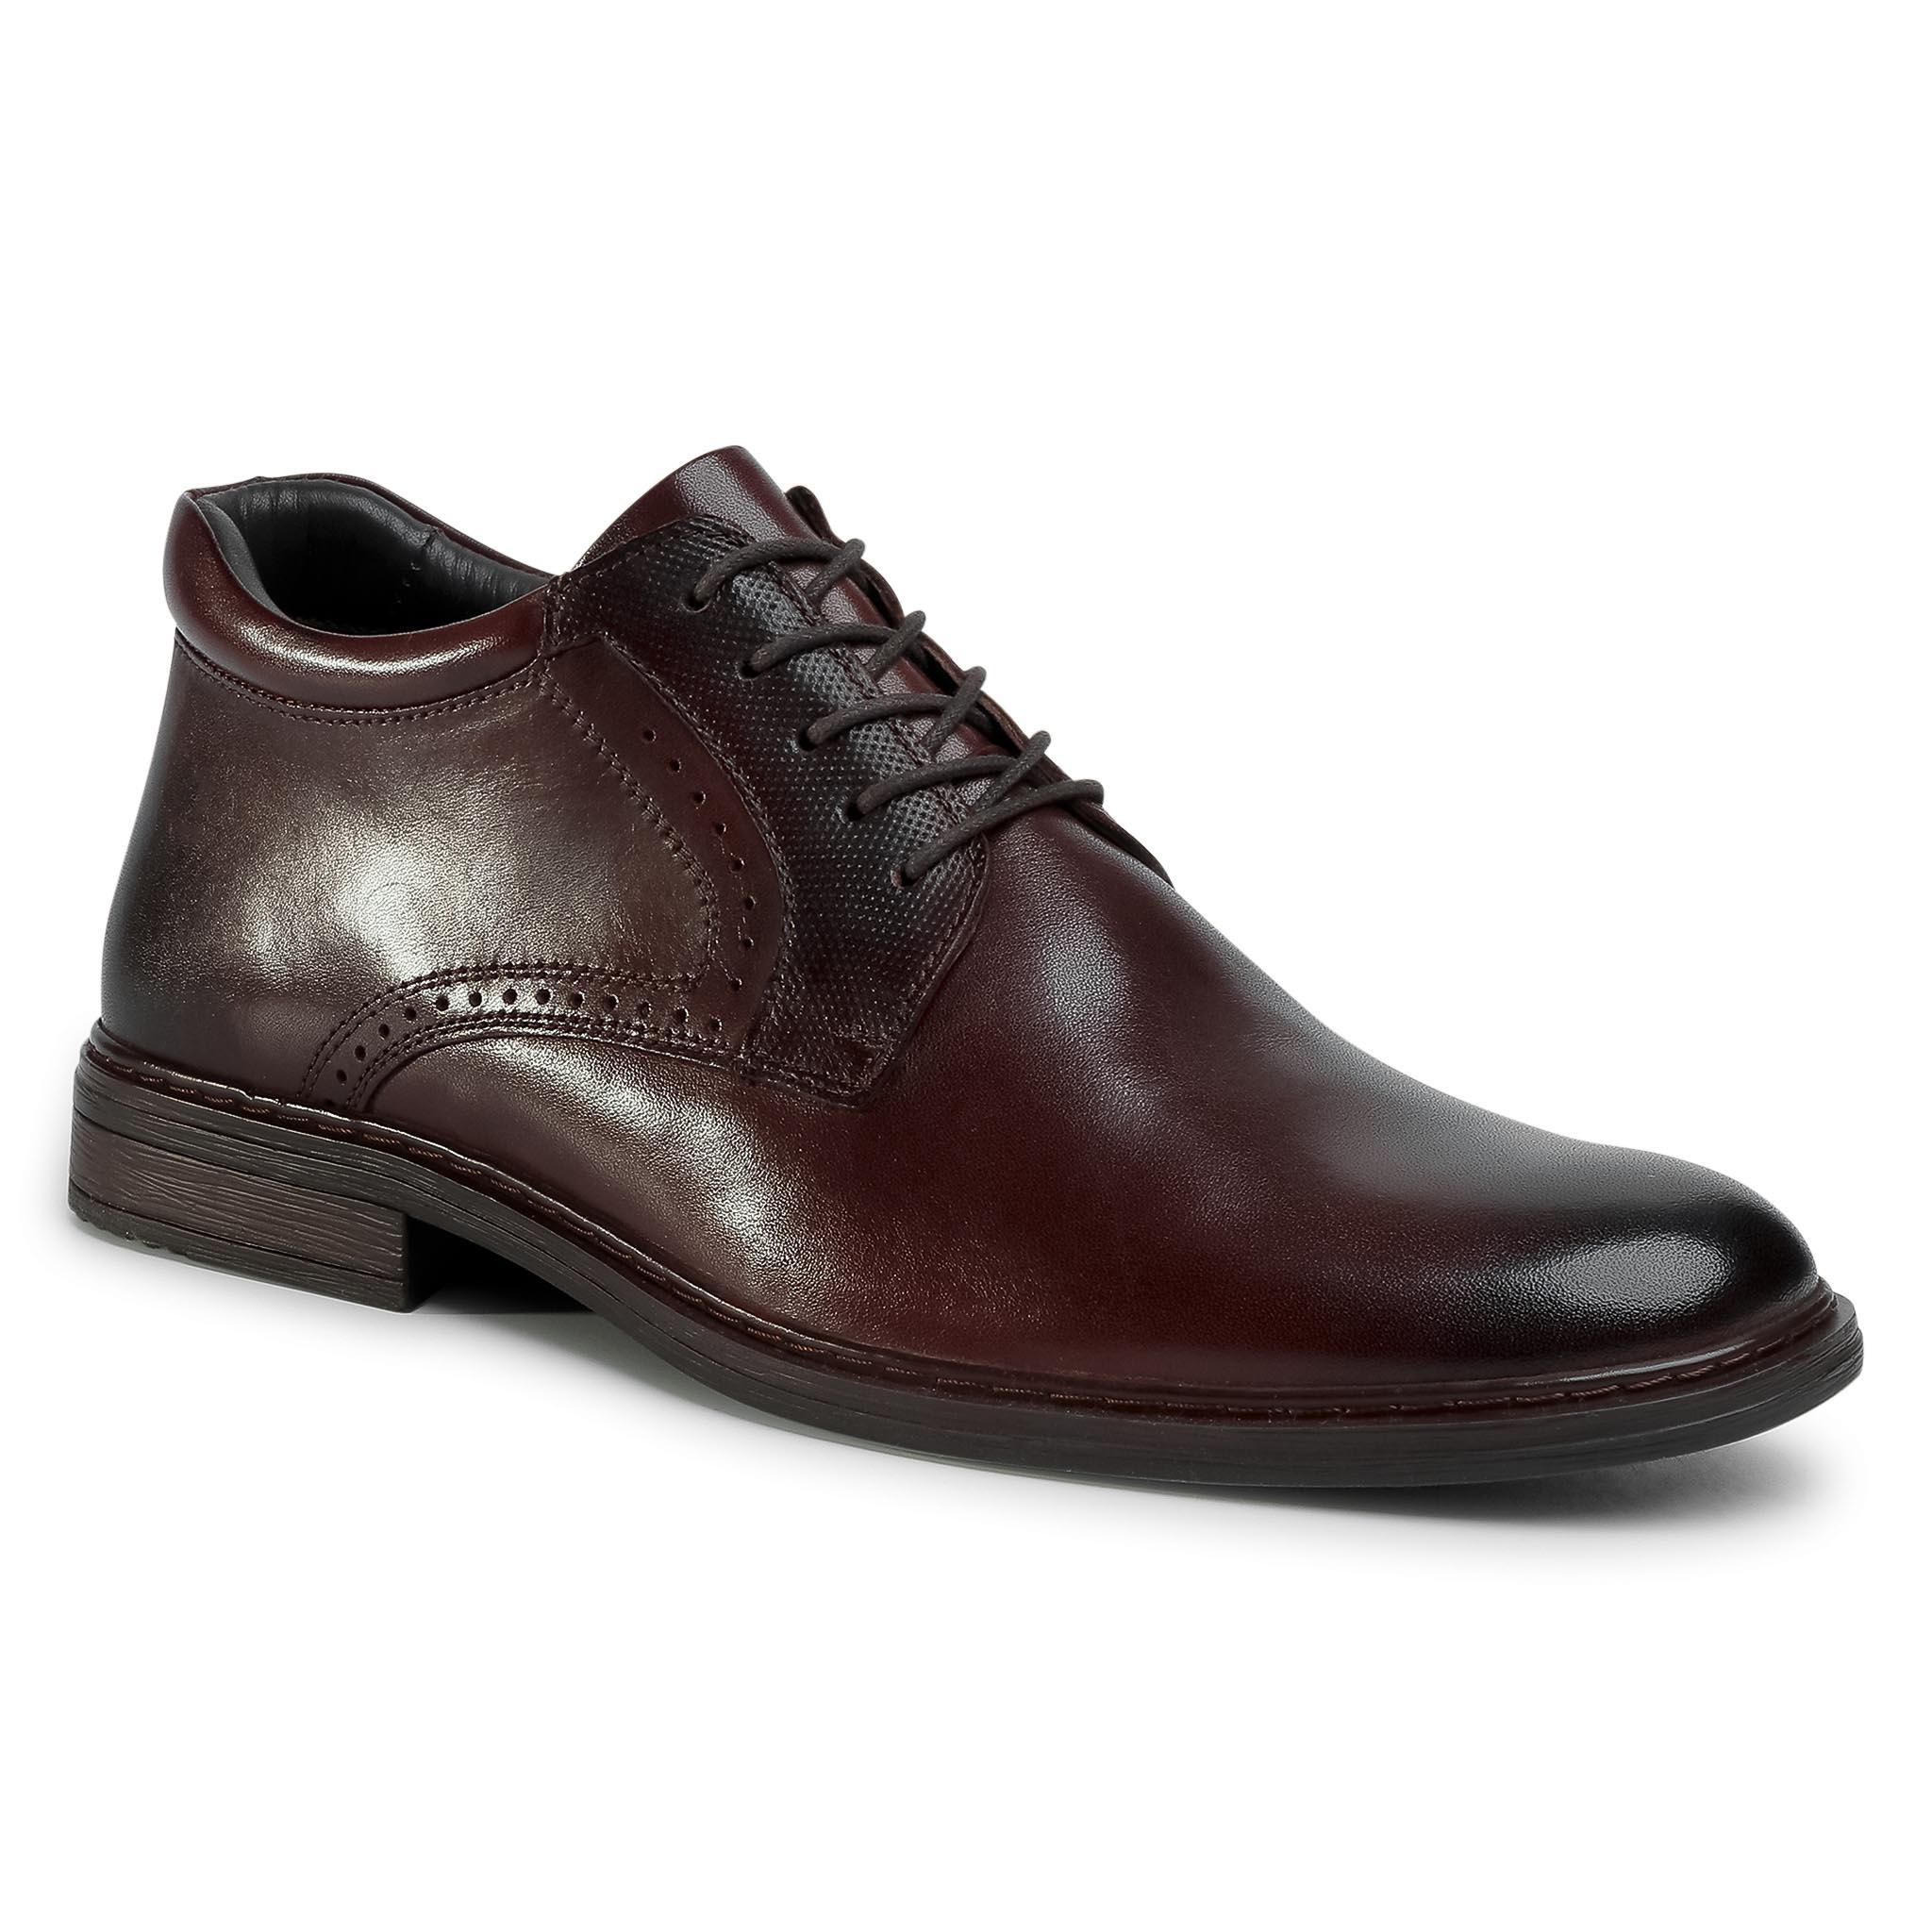 Outdoorová obuv LASOCKI FOR MEN - MI07-A933-A761-08 Brown